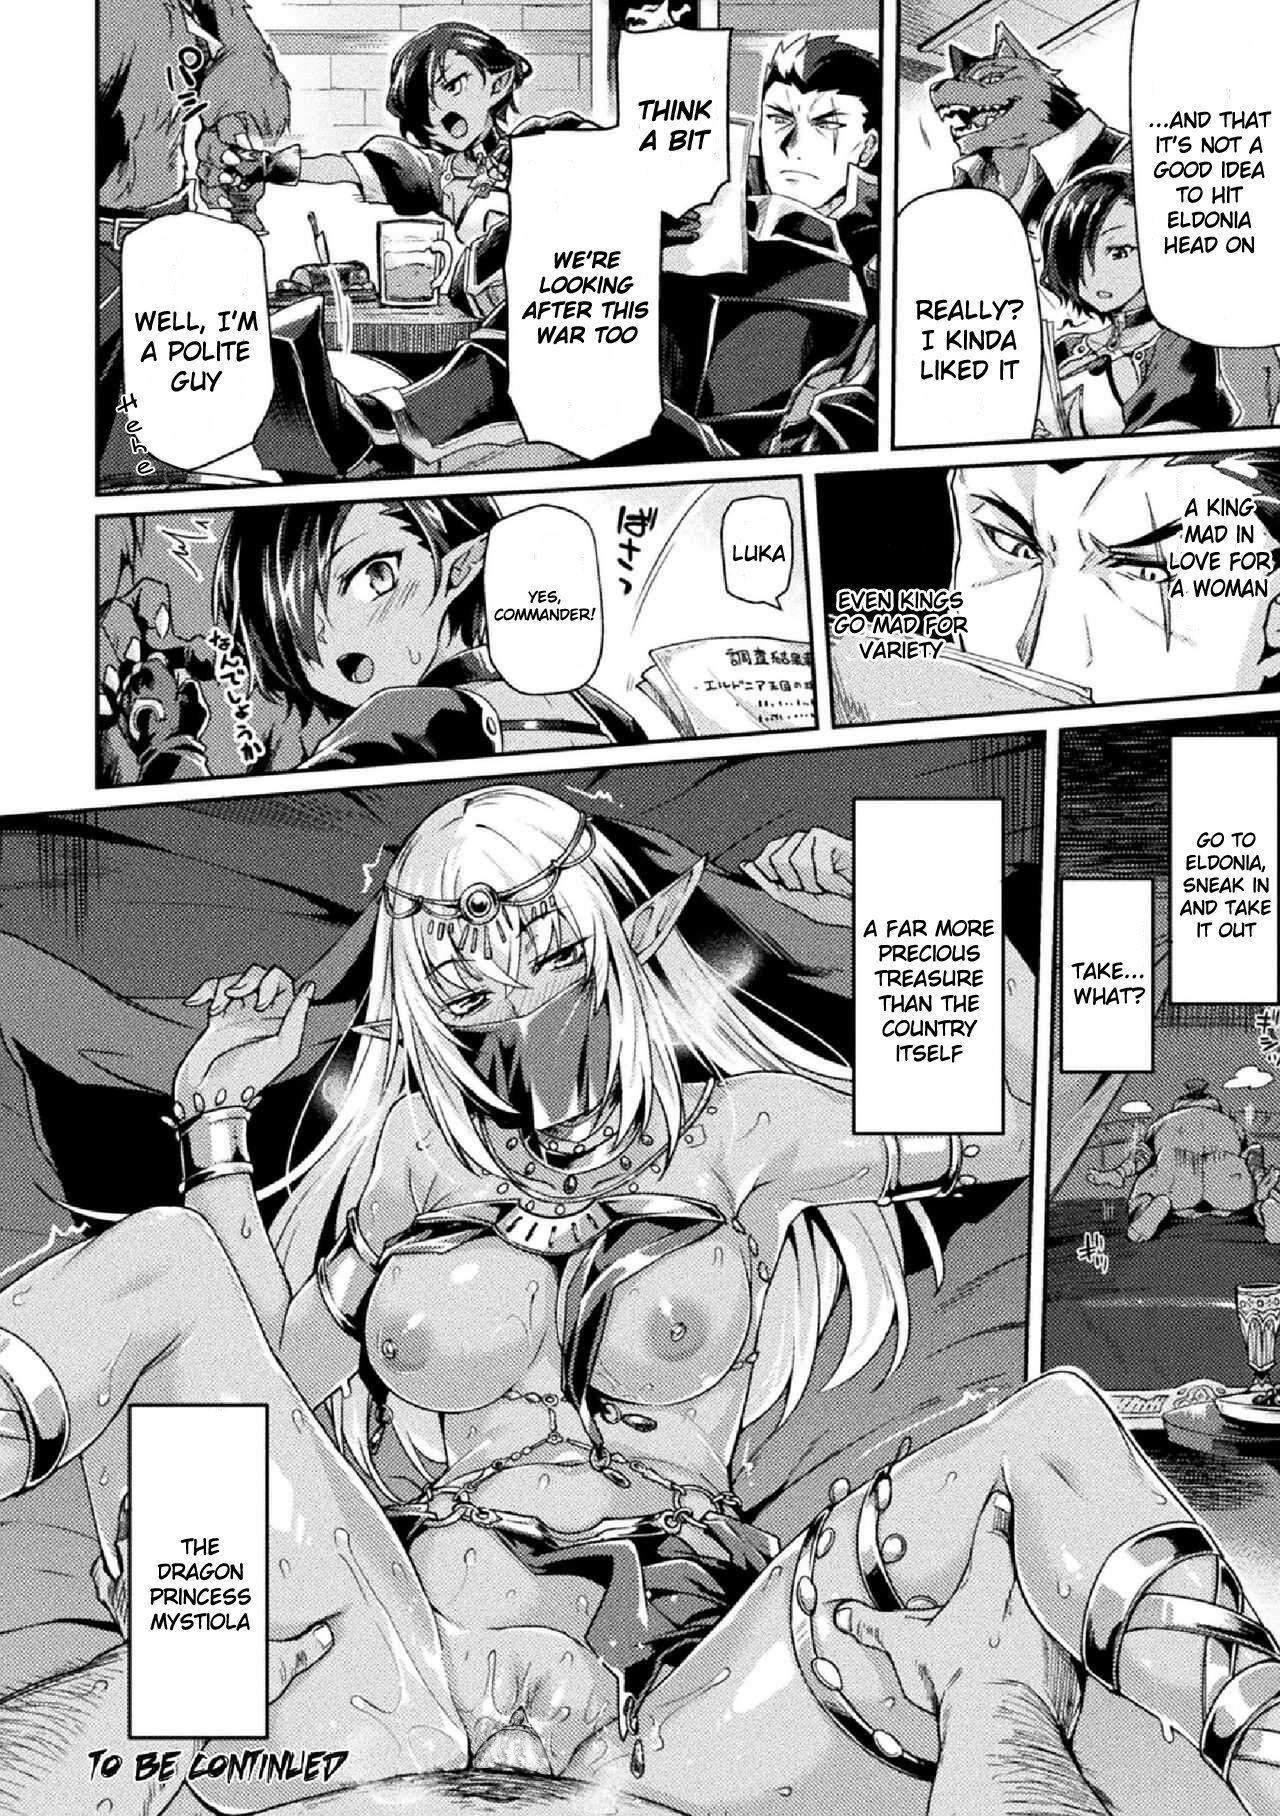 [Tsukitokage] Kuroinu II ~Inyoku ni Somaru Haitoku no Miyako, Futatabi~ THE COMIC Chapter 5 (Kukkoro Heroines Vol. 5) [Digital] [English] [Decensored] (Klub Kemoner) 19